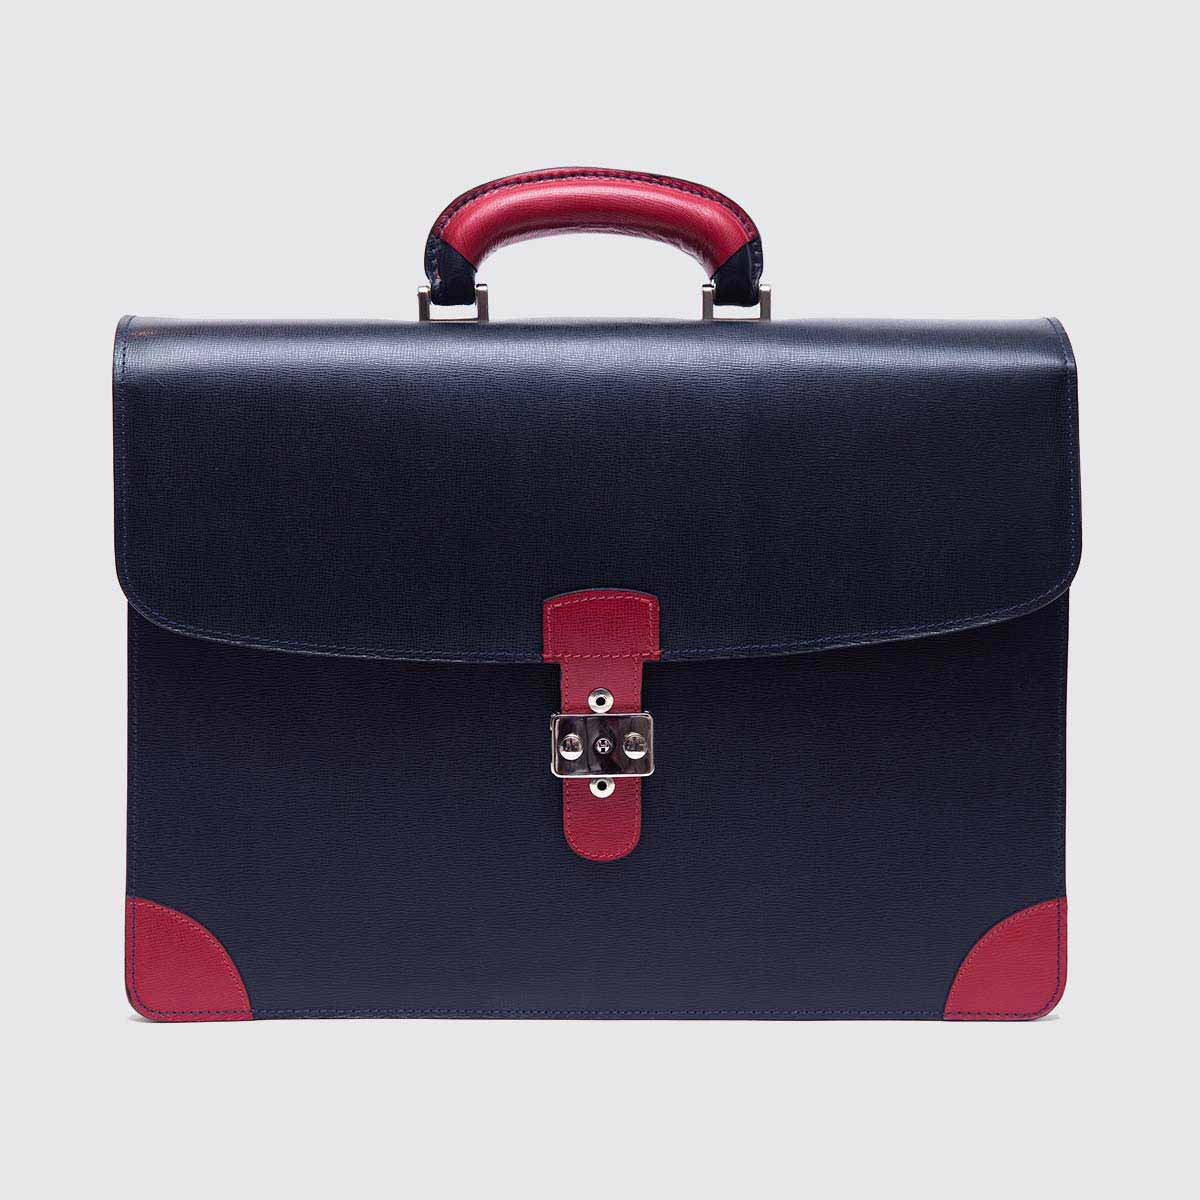 Rigid briefcase in blue navy calf leather